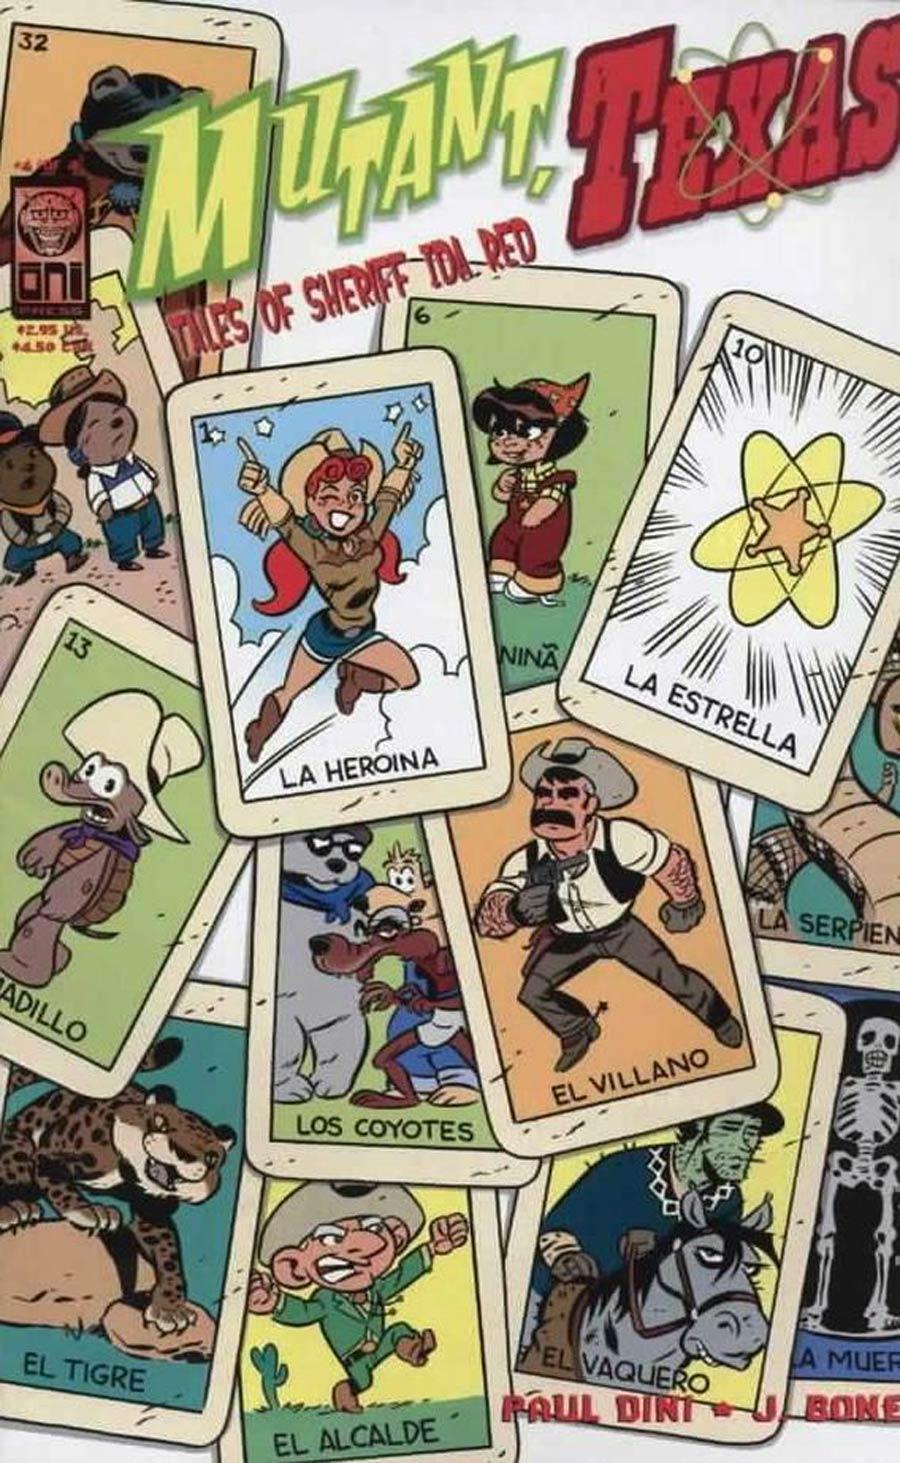 Mutant Texas Tales Of Sheriff Ida Red #4